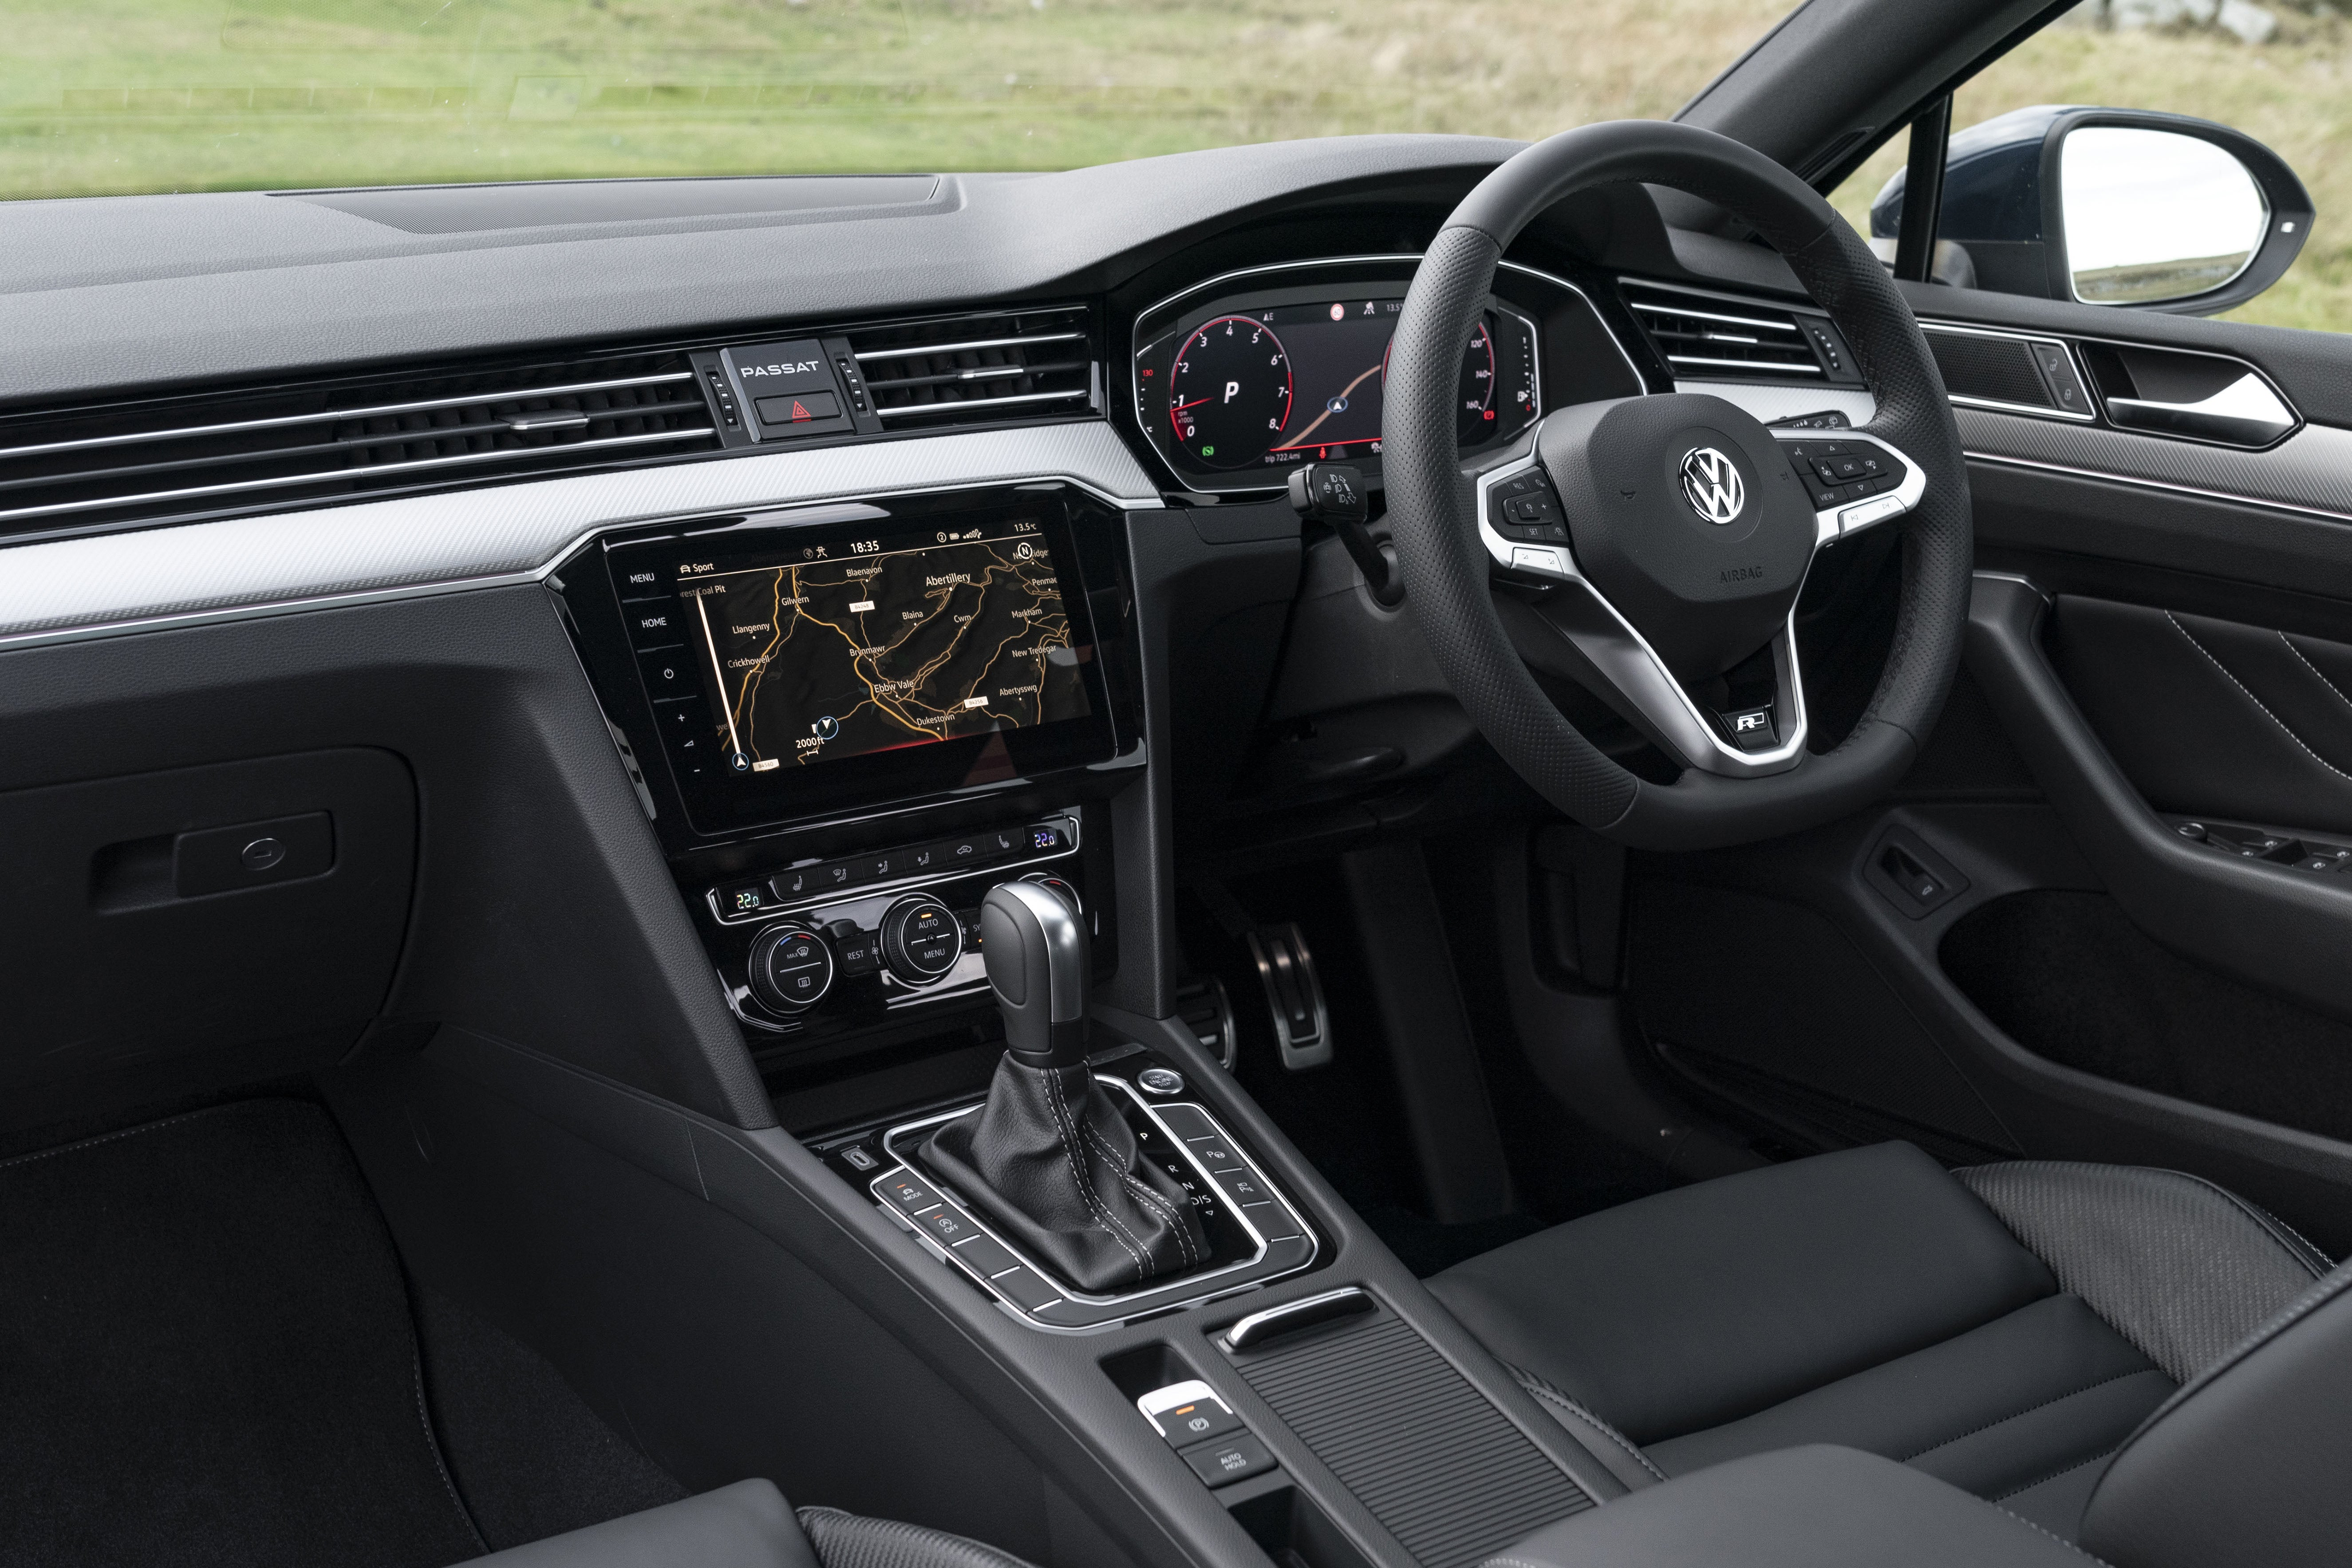 Volkswagen Passat Estate Front Interior